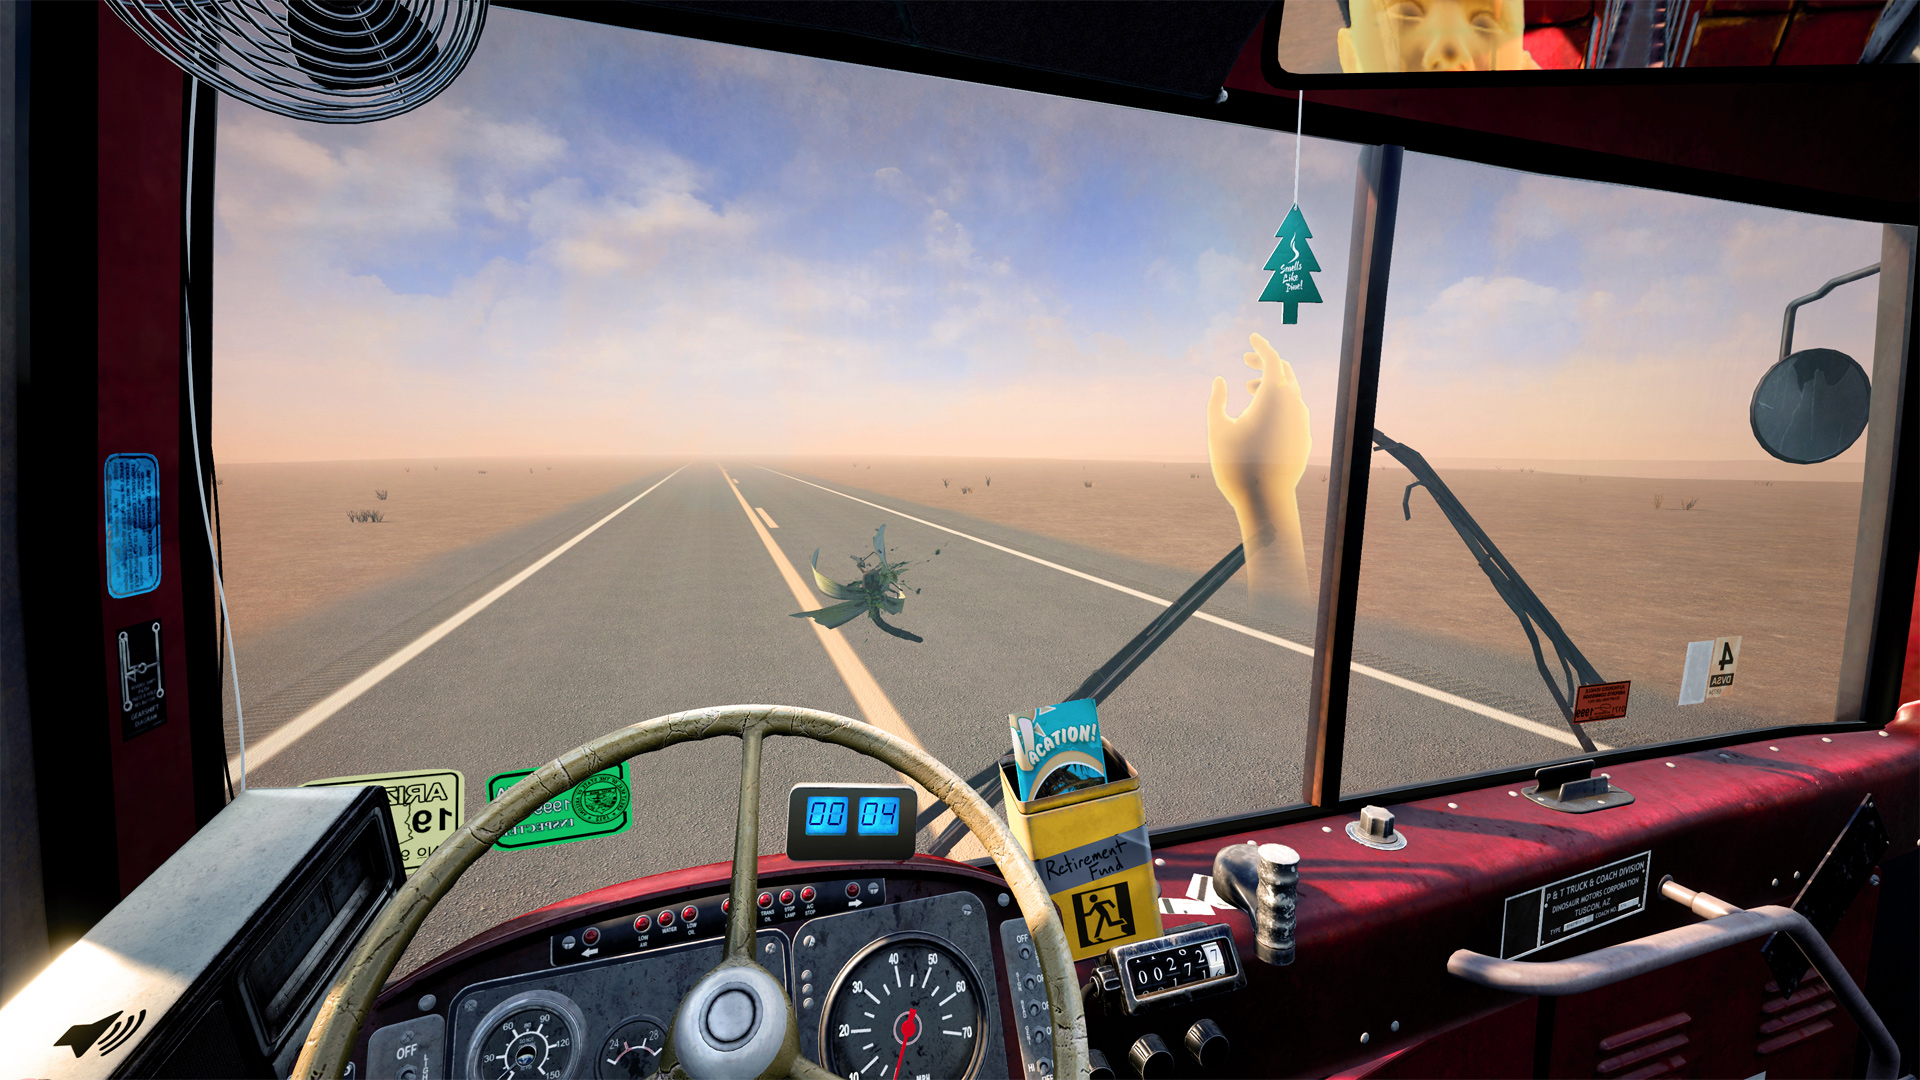 Infamous driving sim Desert Bus now playable in VR screenshot